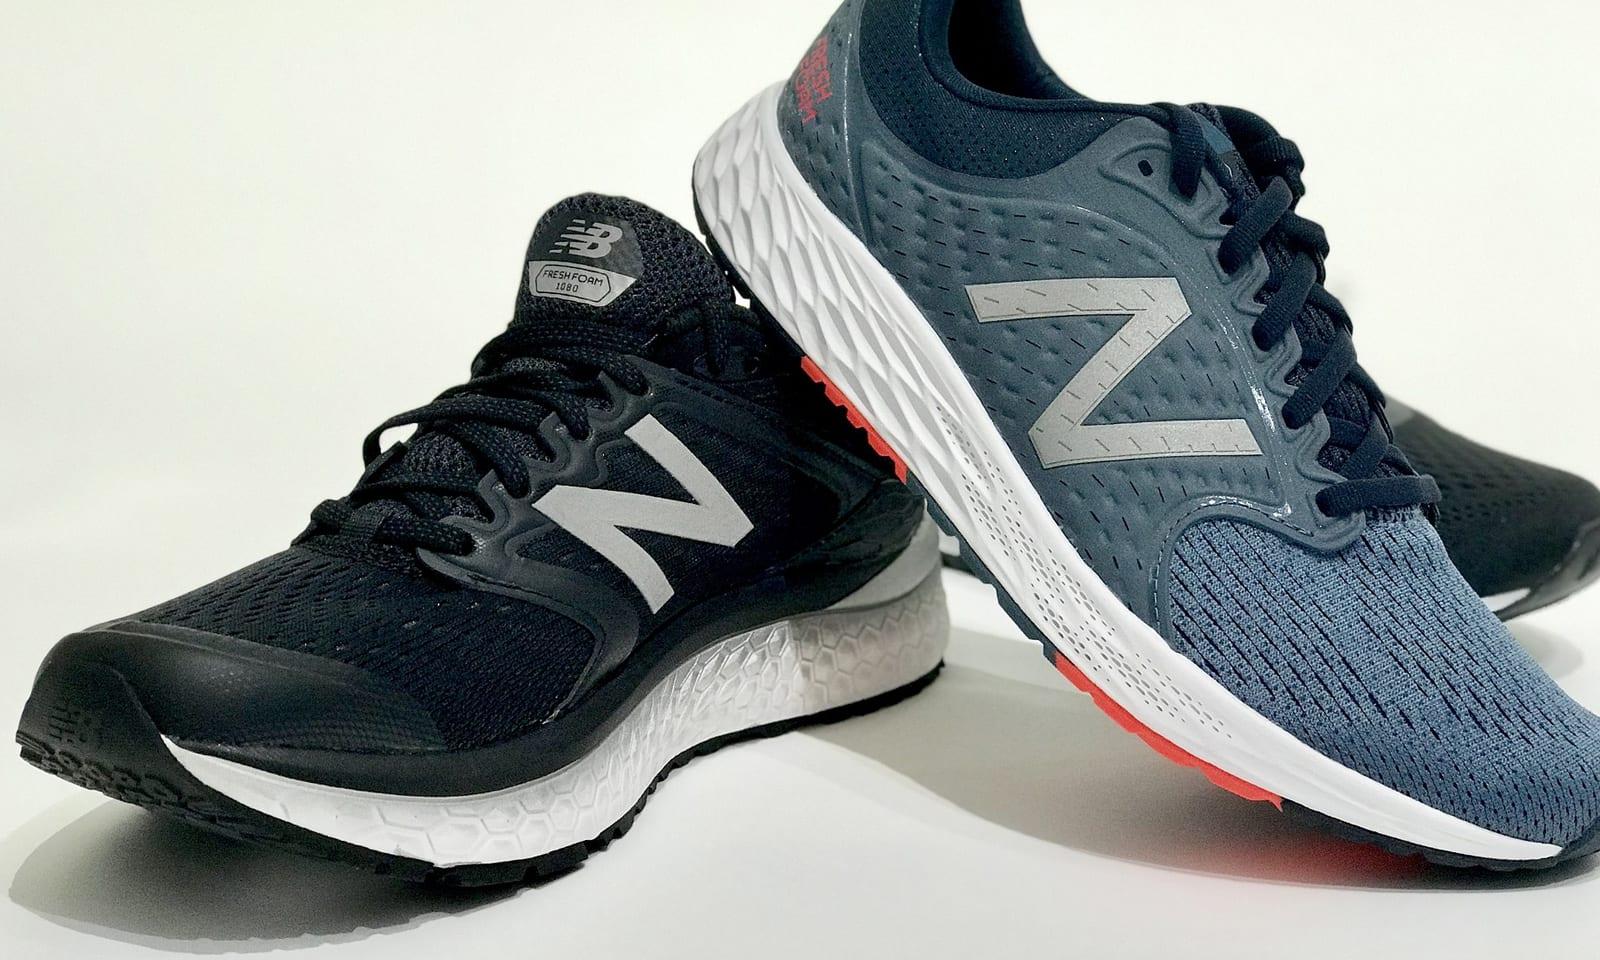 quality design b7304 b58fc 10 New Balance Running Shoes [ 2019 Reviews ] - Shoe Adviser